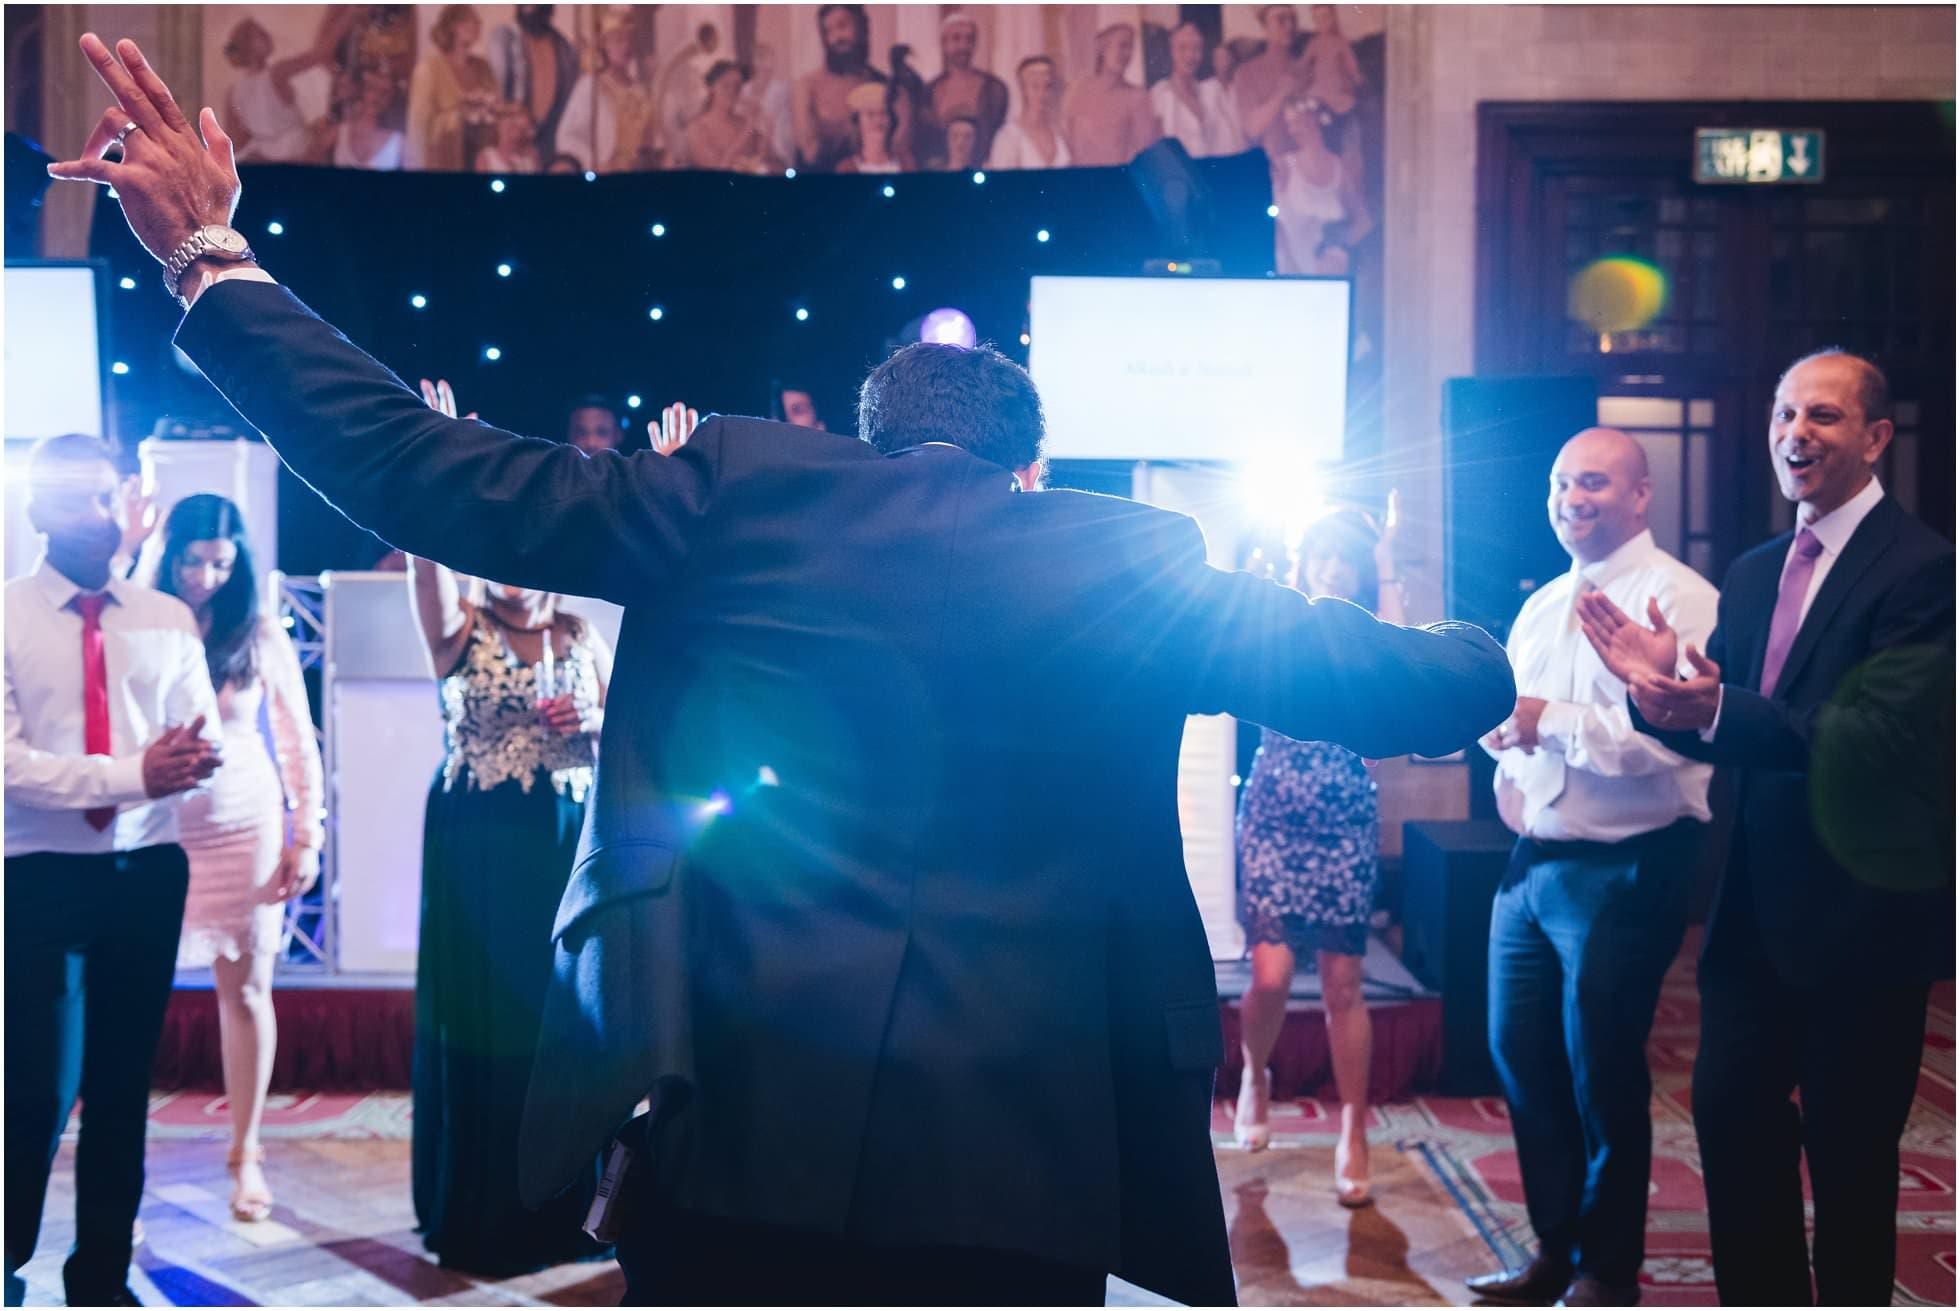 The groom hits the dance floor